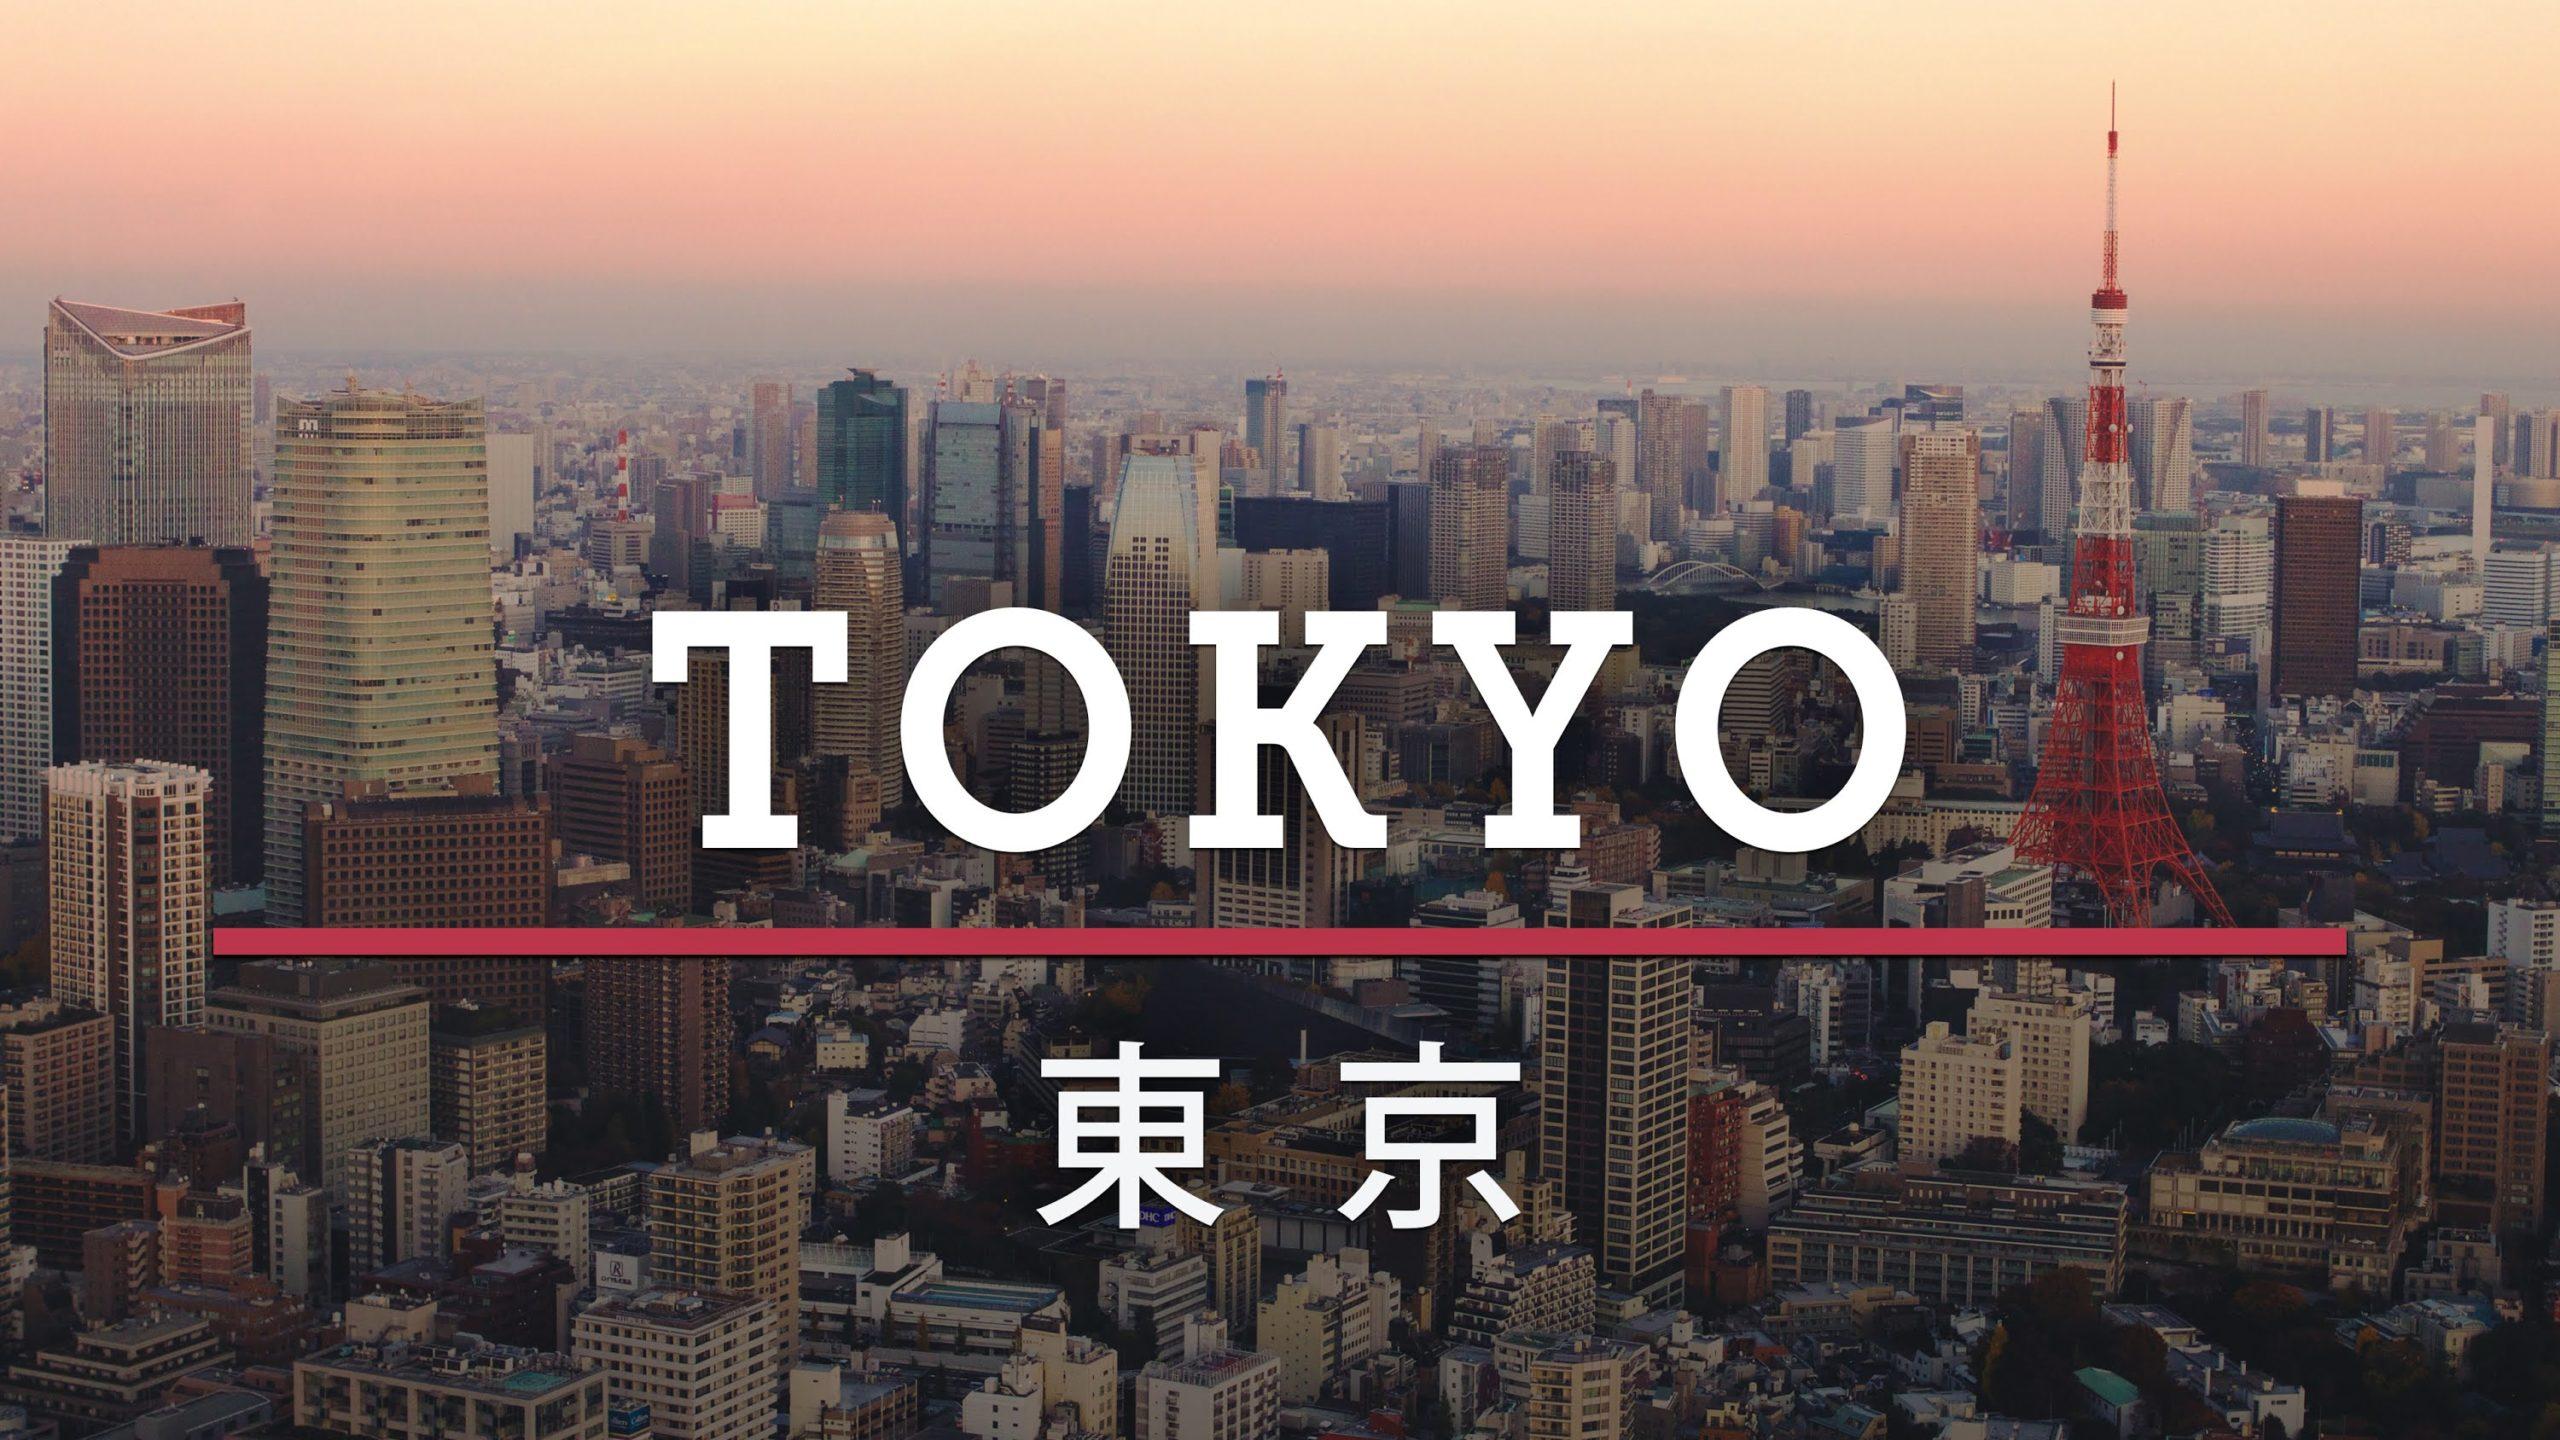 Tokyo Wallpaper 4k